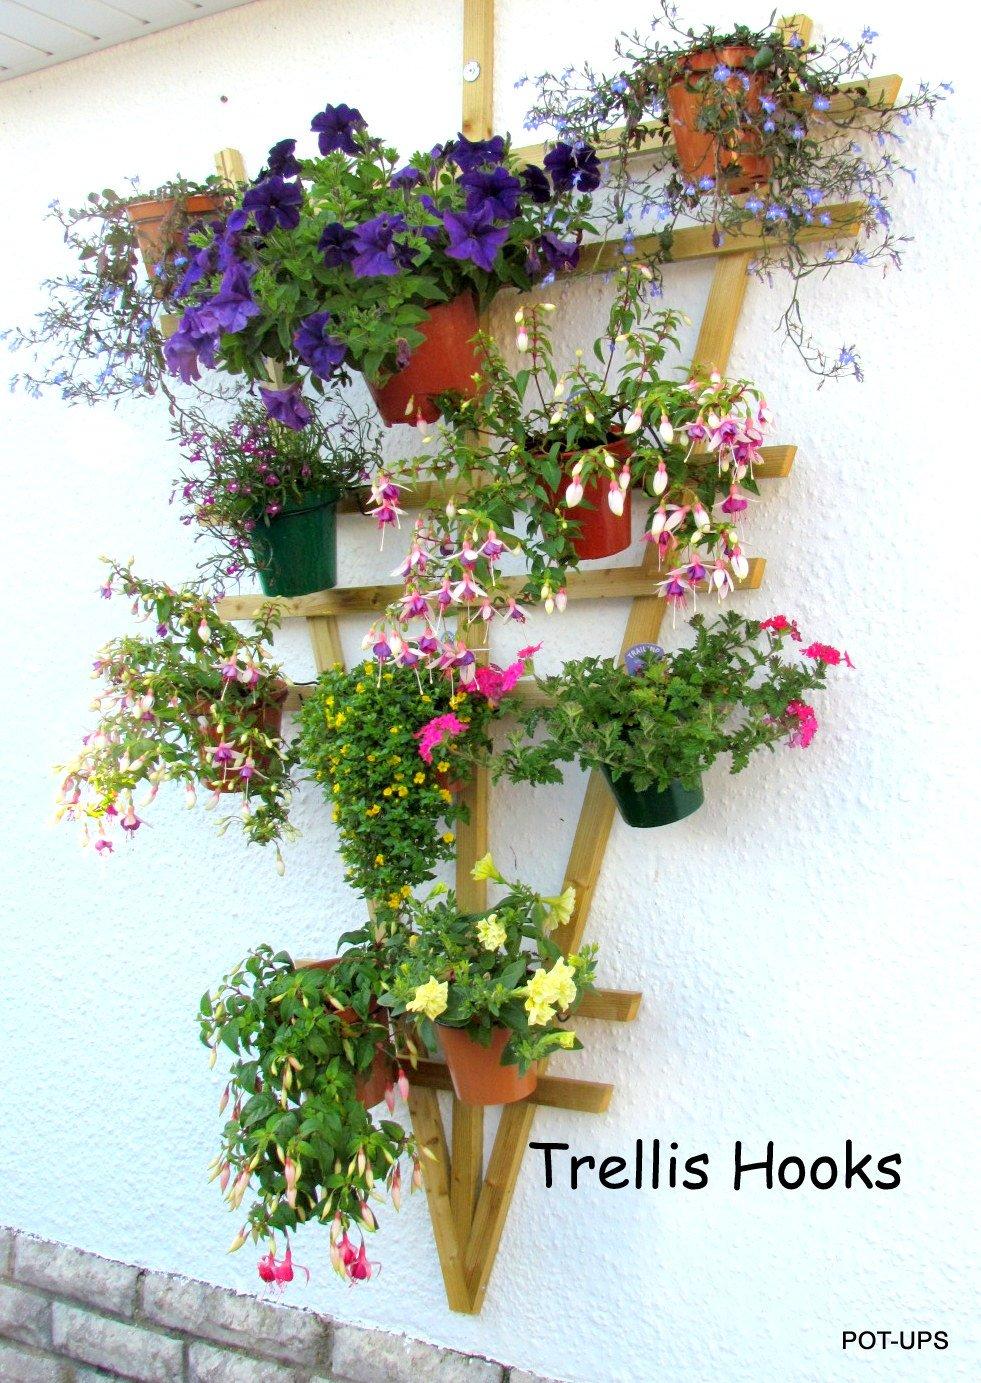 Trellis Hooks, 6 plant pot holders to hang 6\